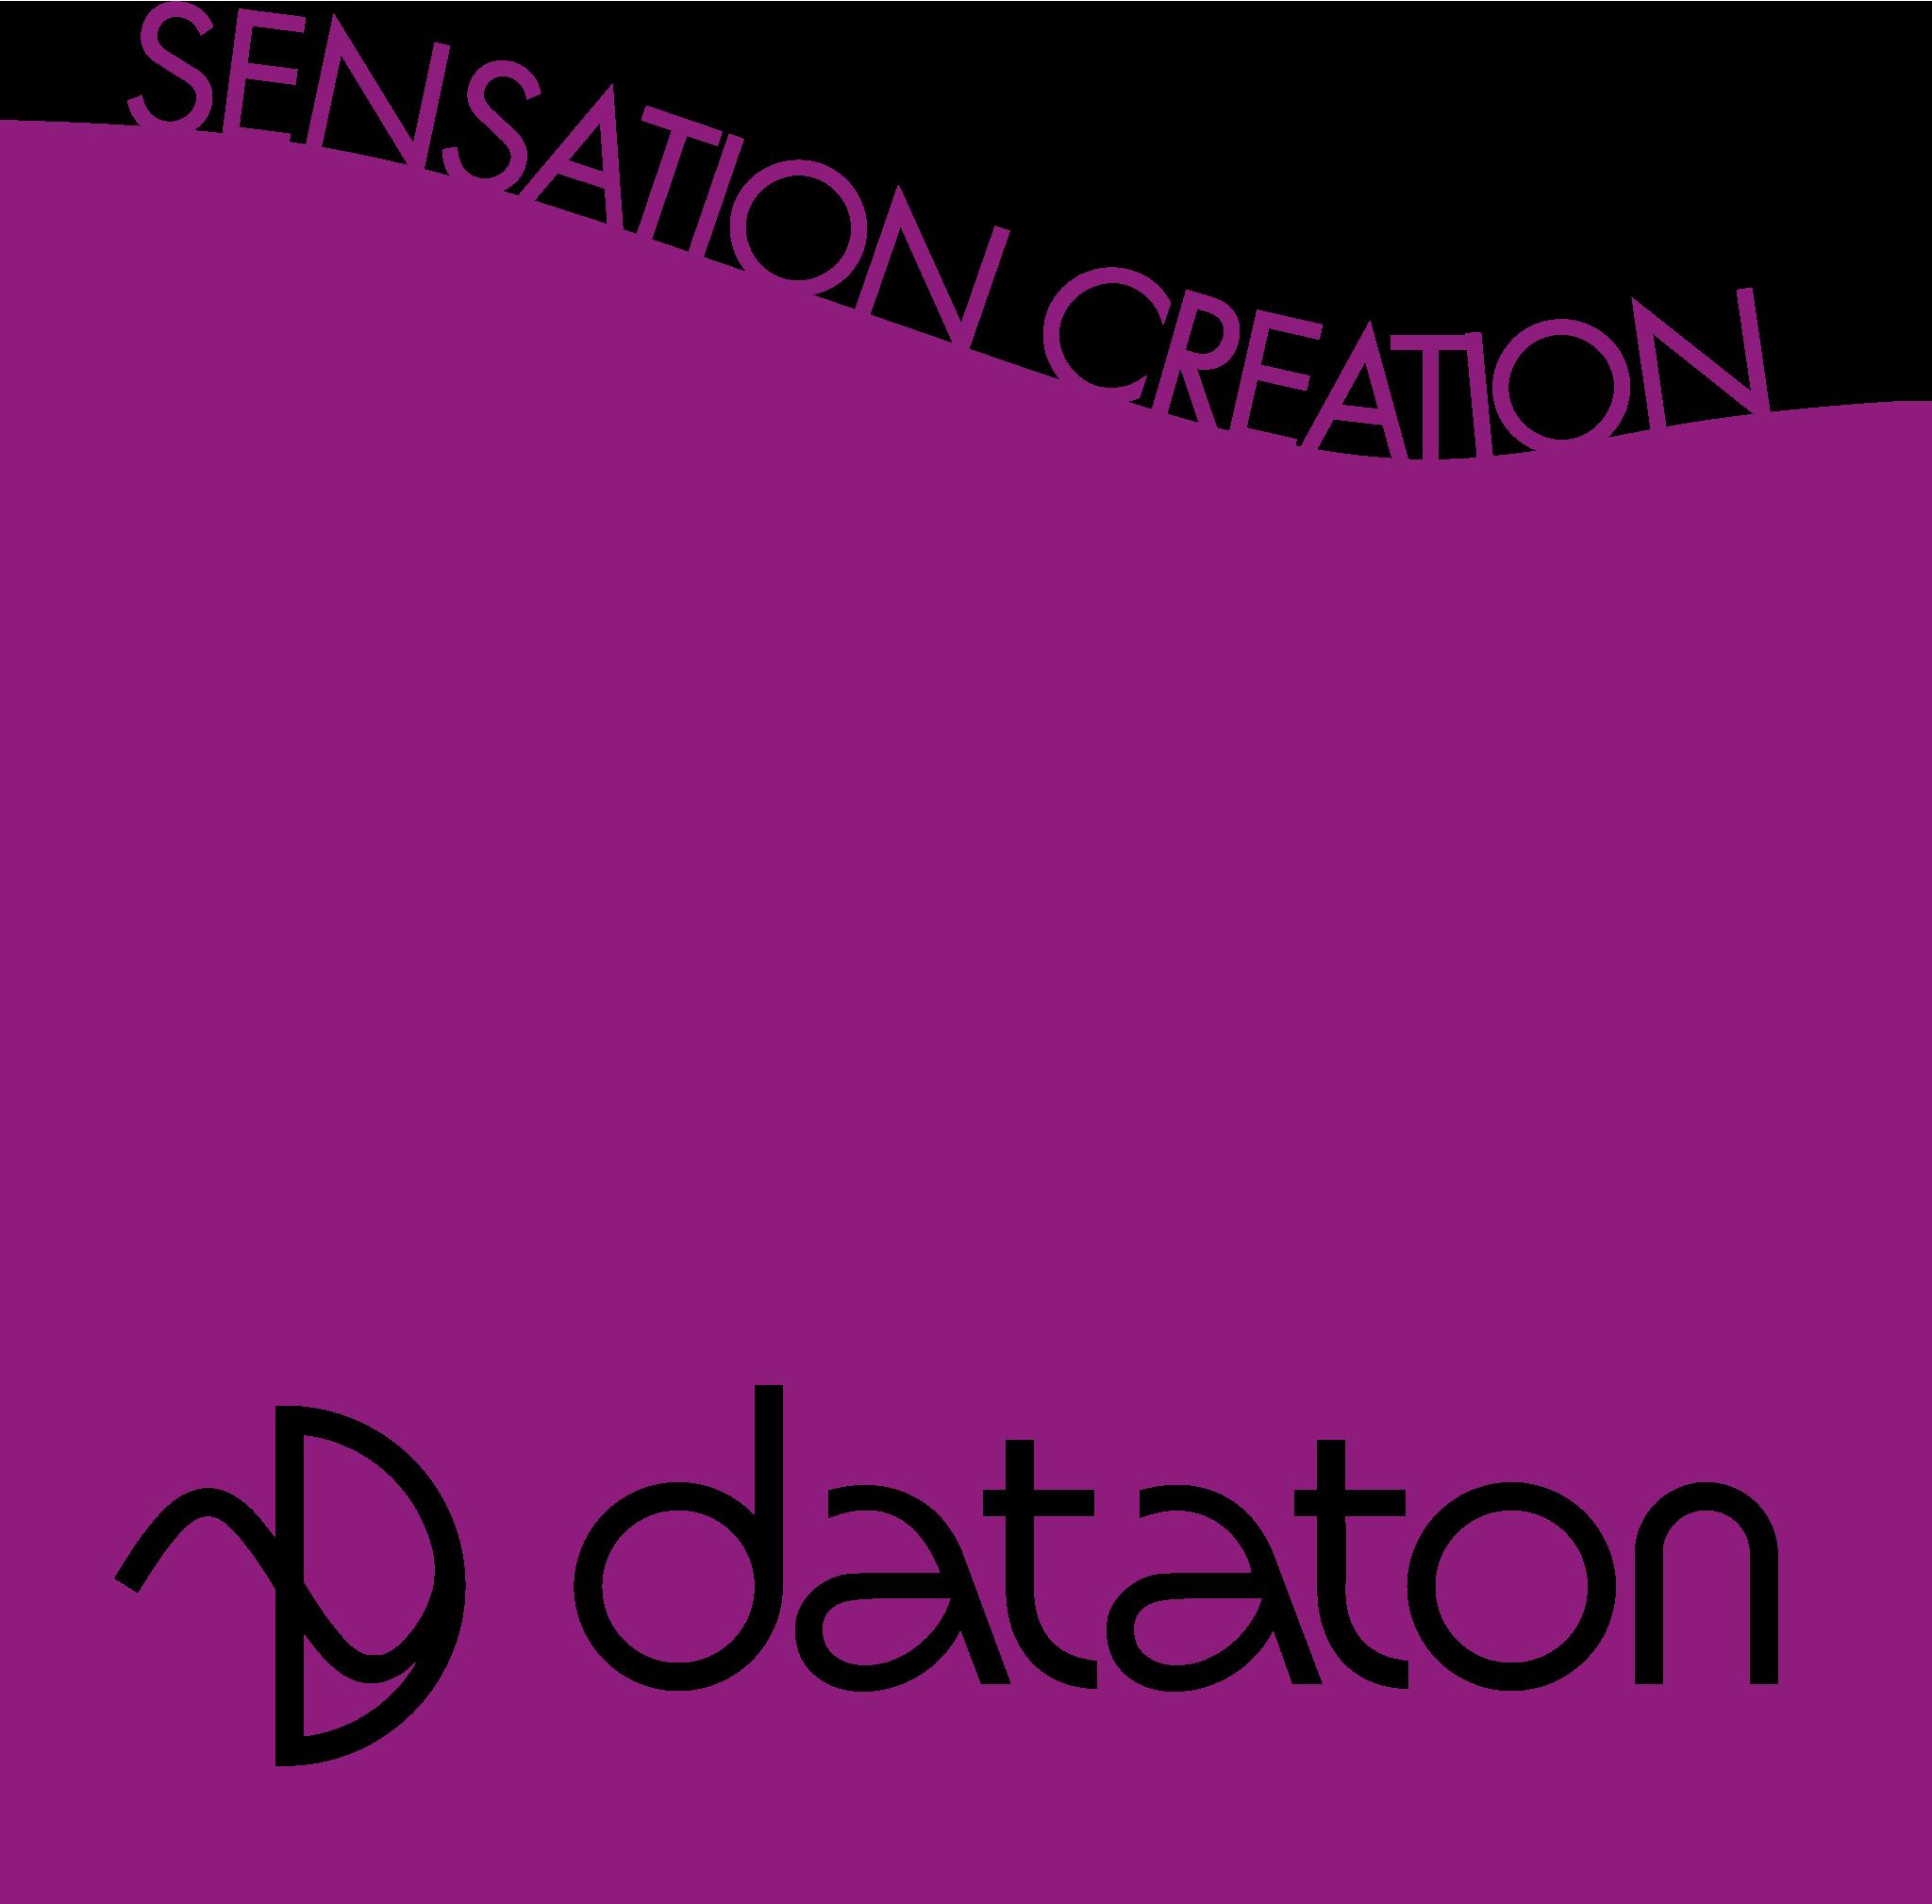 Dataton